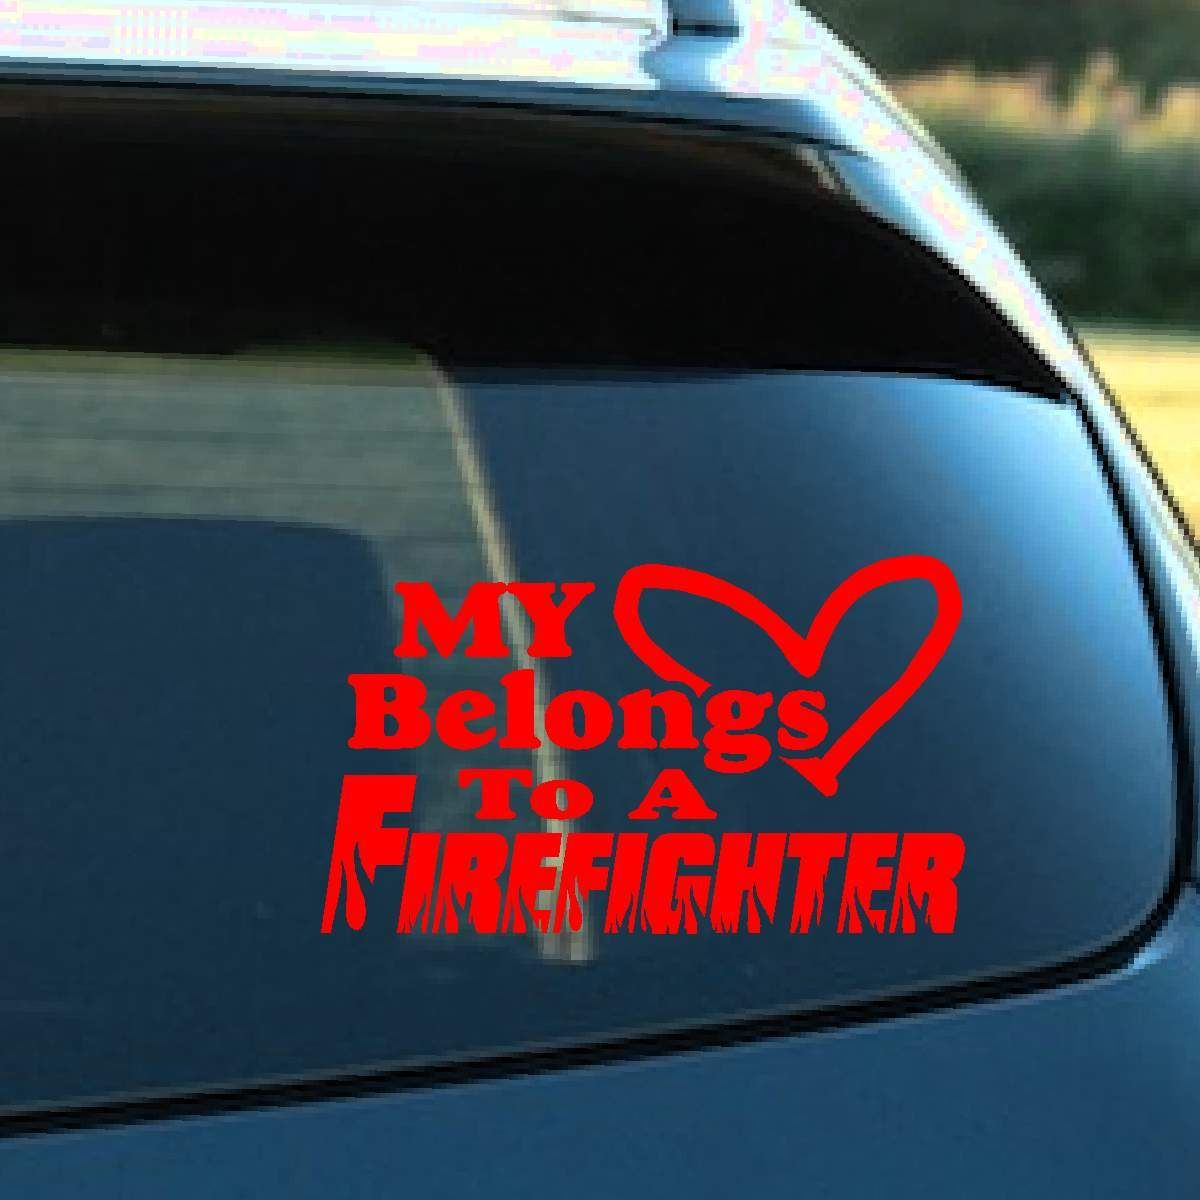 My Heart Belongs To A Firefighter Decal Firefighter Decals Firefighter Decals Cars Firefighter [ 1200 x 1200 Pixel ]